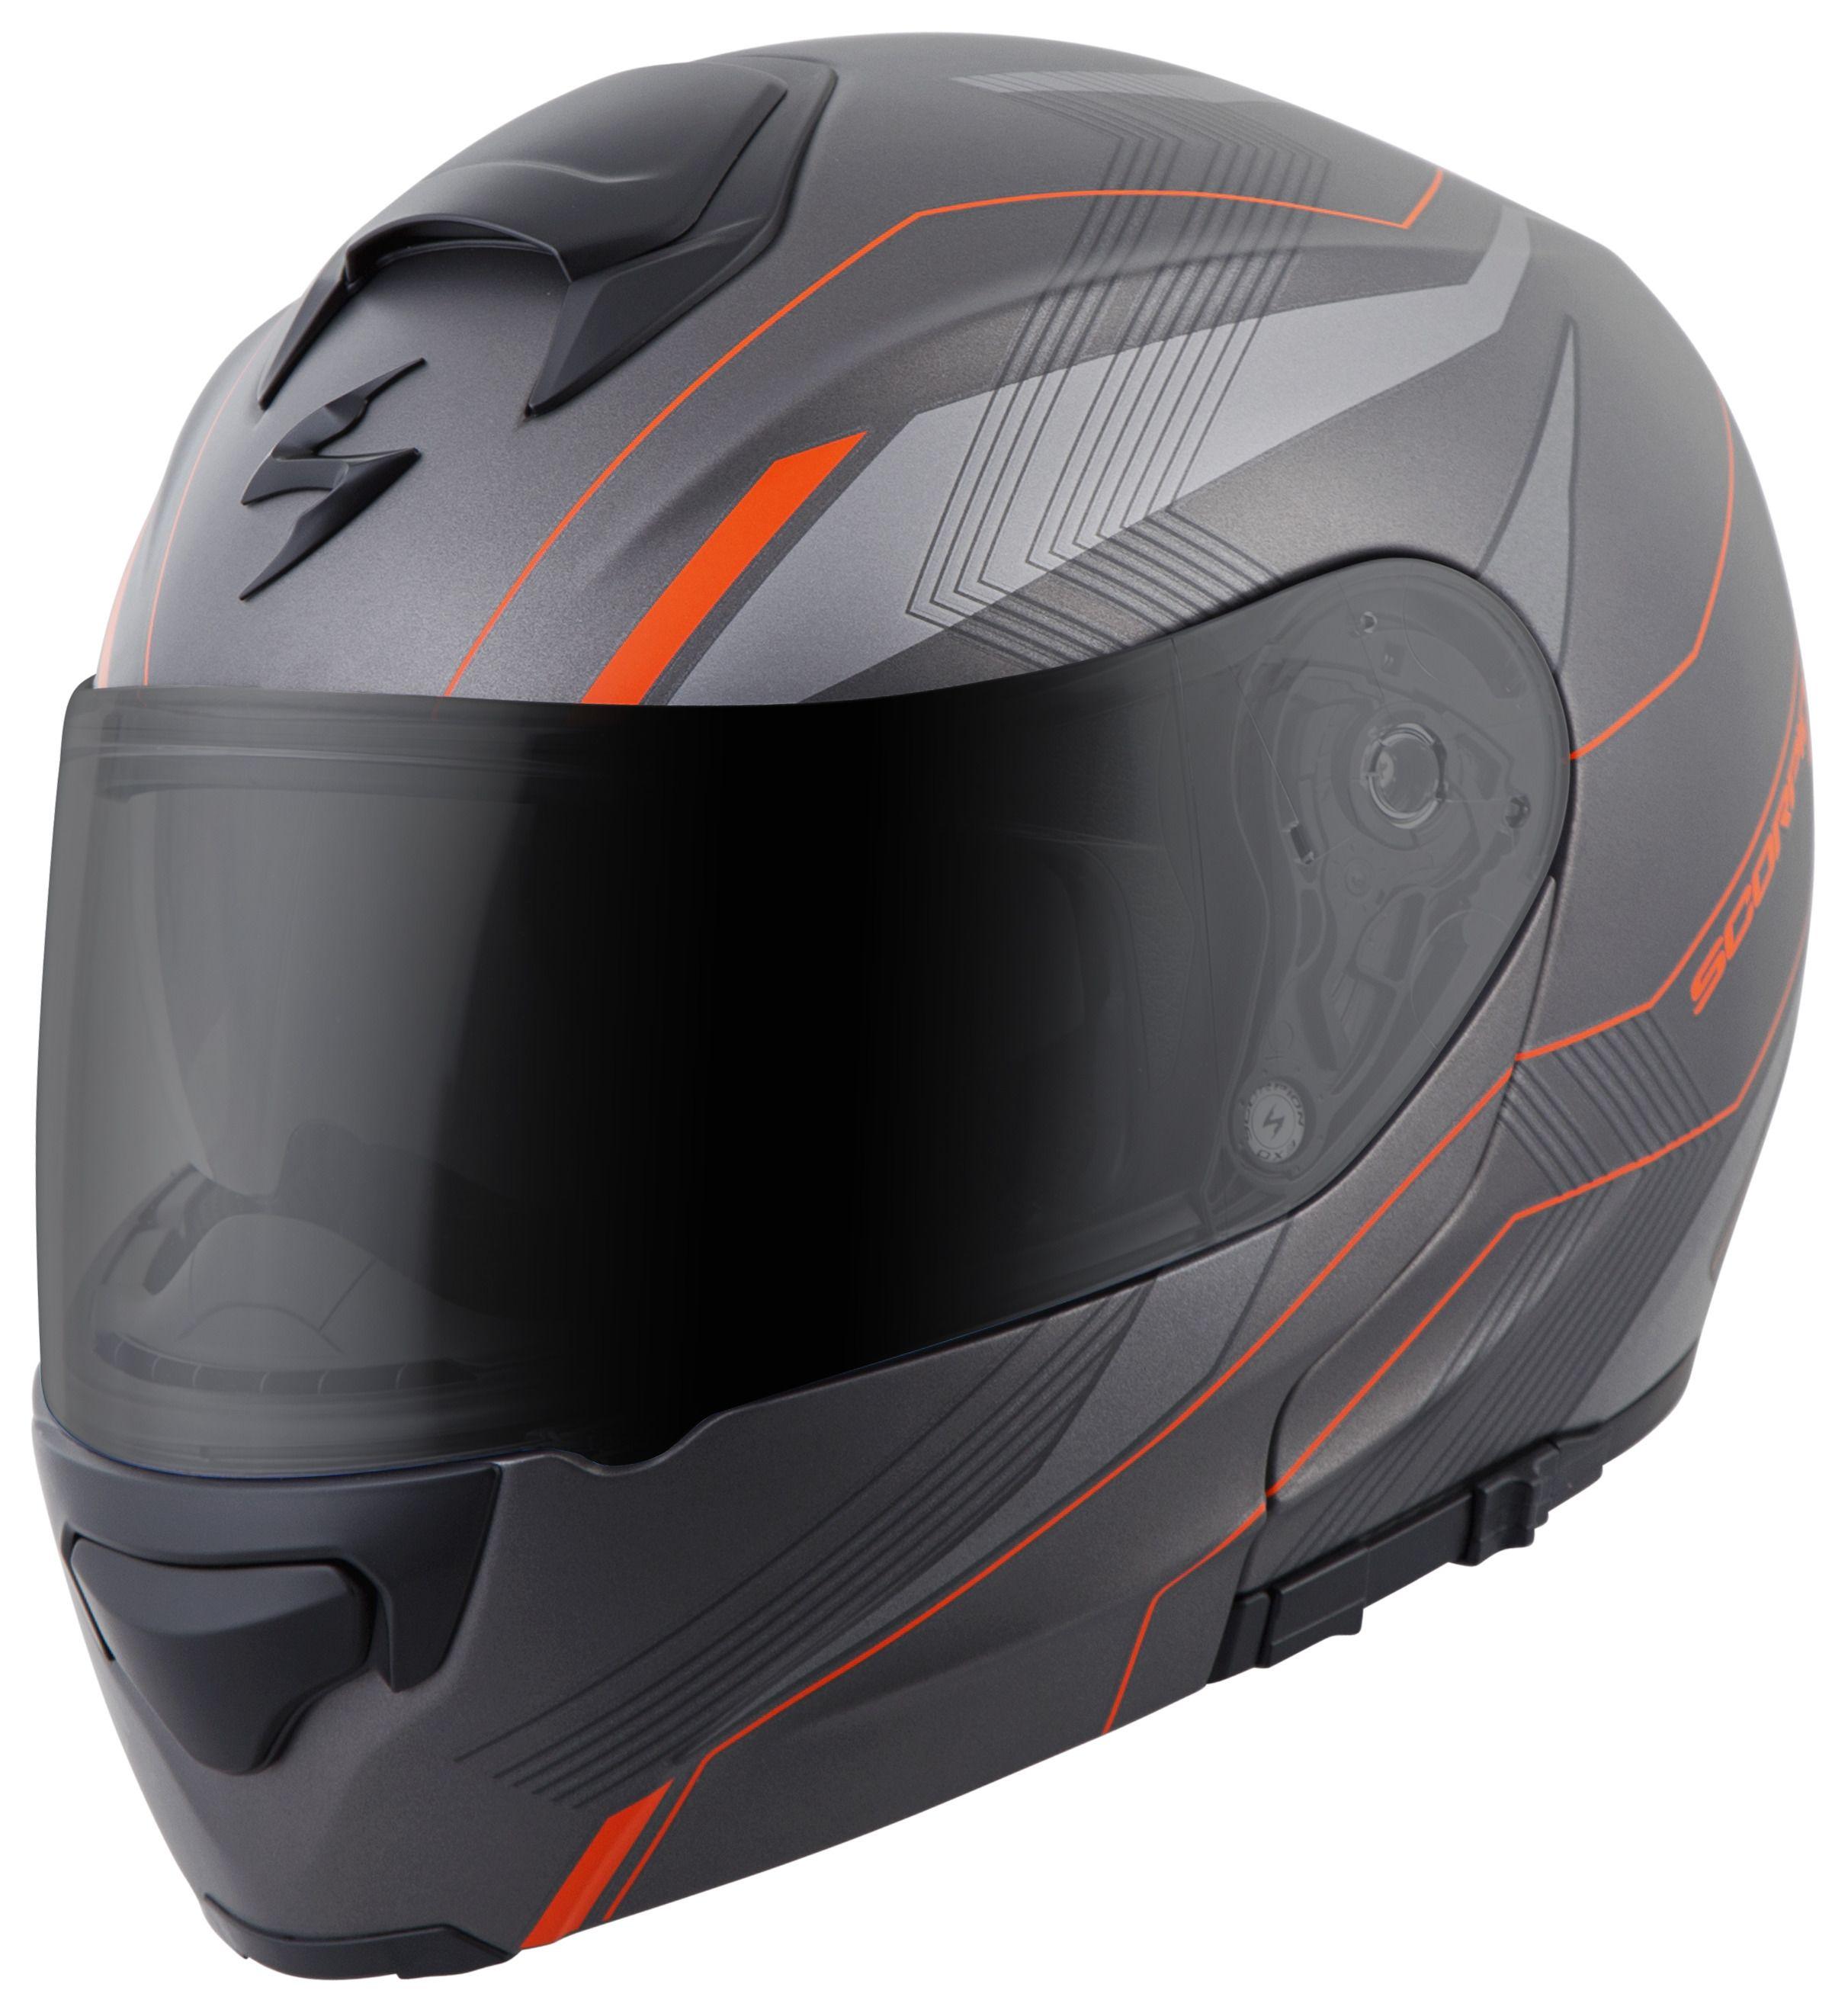 scorpion exo gt3000 sync helmet revzilla. Black Bedroom Furniture Sets. Home Design Ideas